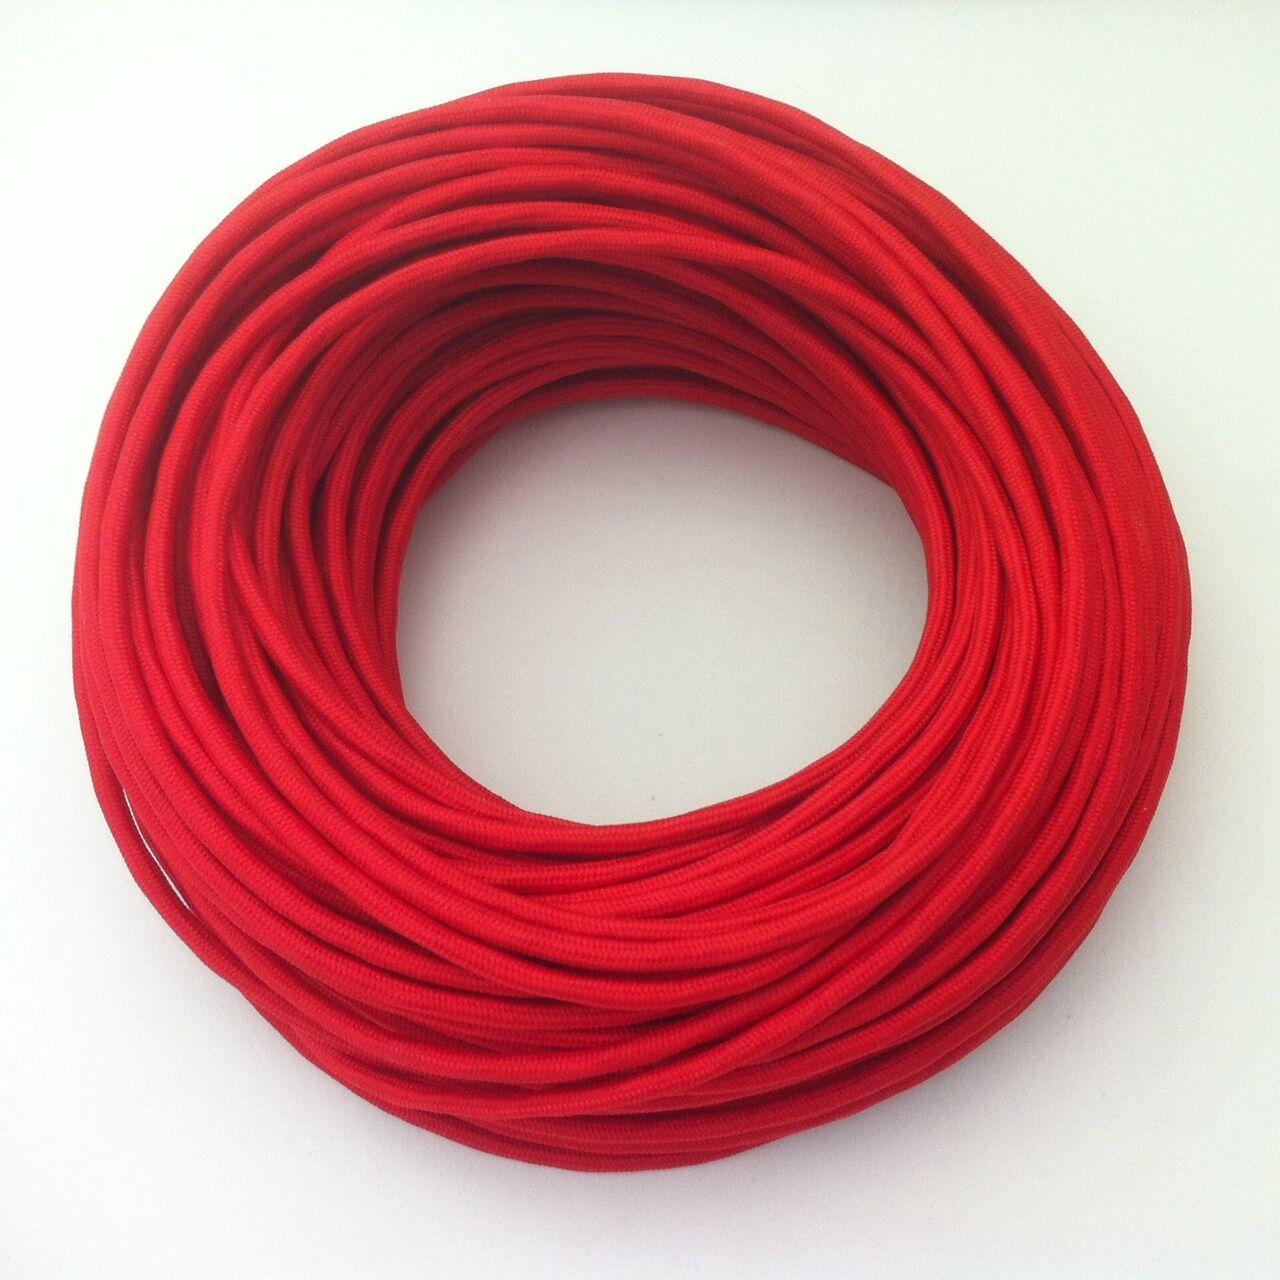 100m Design Textilkabel Stoffkabel Zug-Pendelleitung Rot 2x0,75 Top EU Qualität